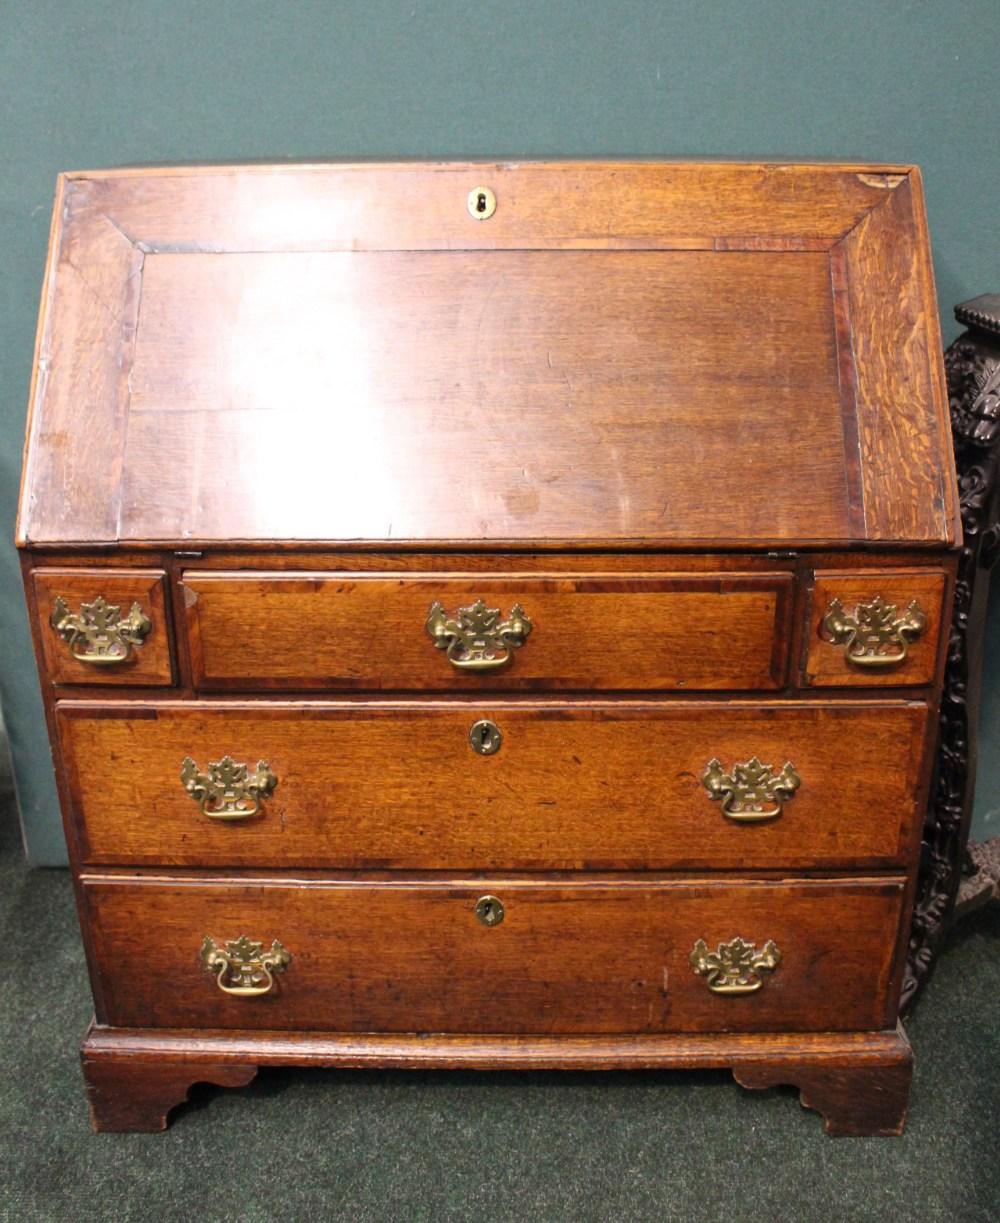 Lot 23 - A LARGE OAK BUREAU DESK/SECRETAIRE, 3 over 2 drawers, cross-banded drop down lid, opens to reveal